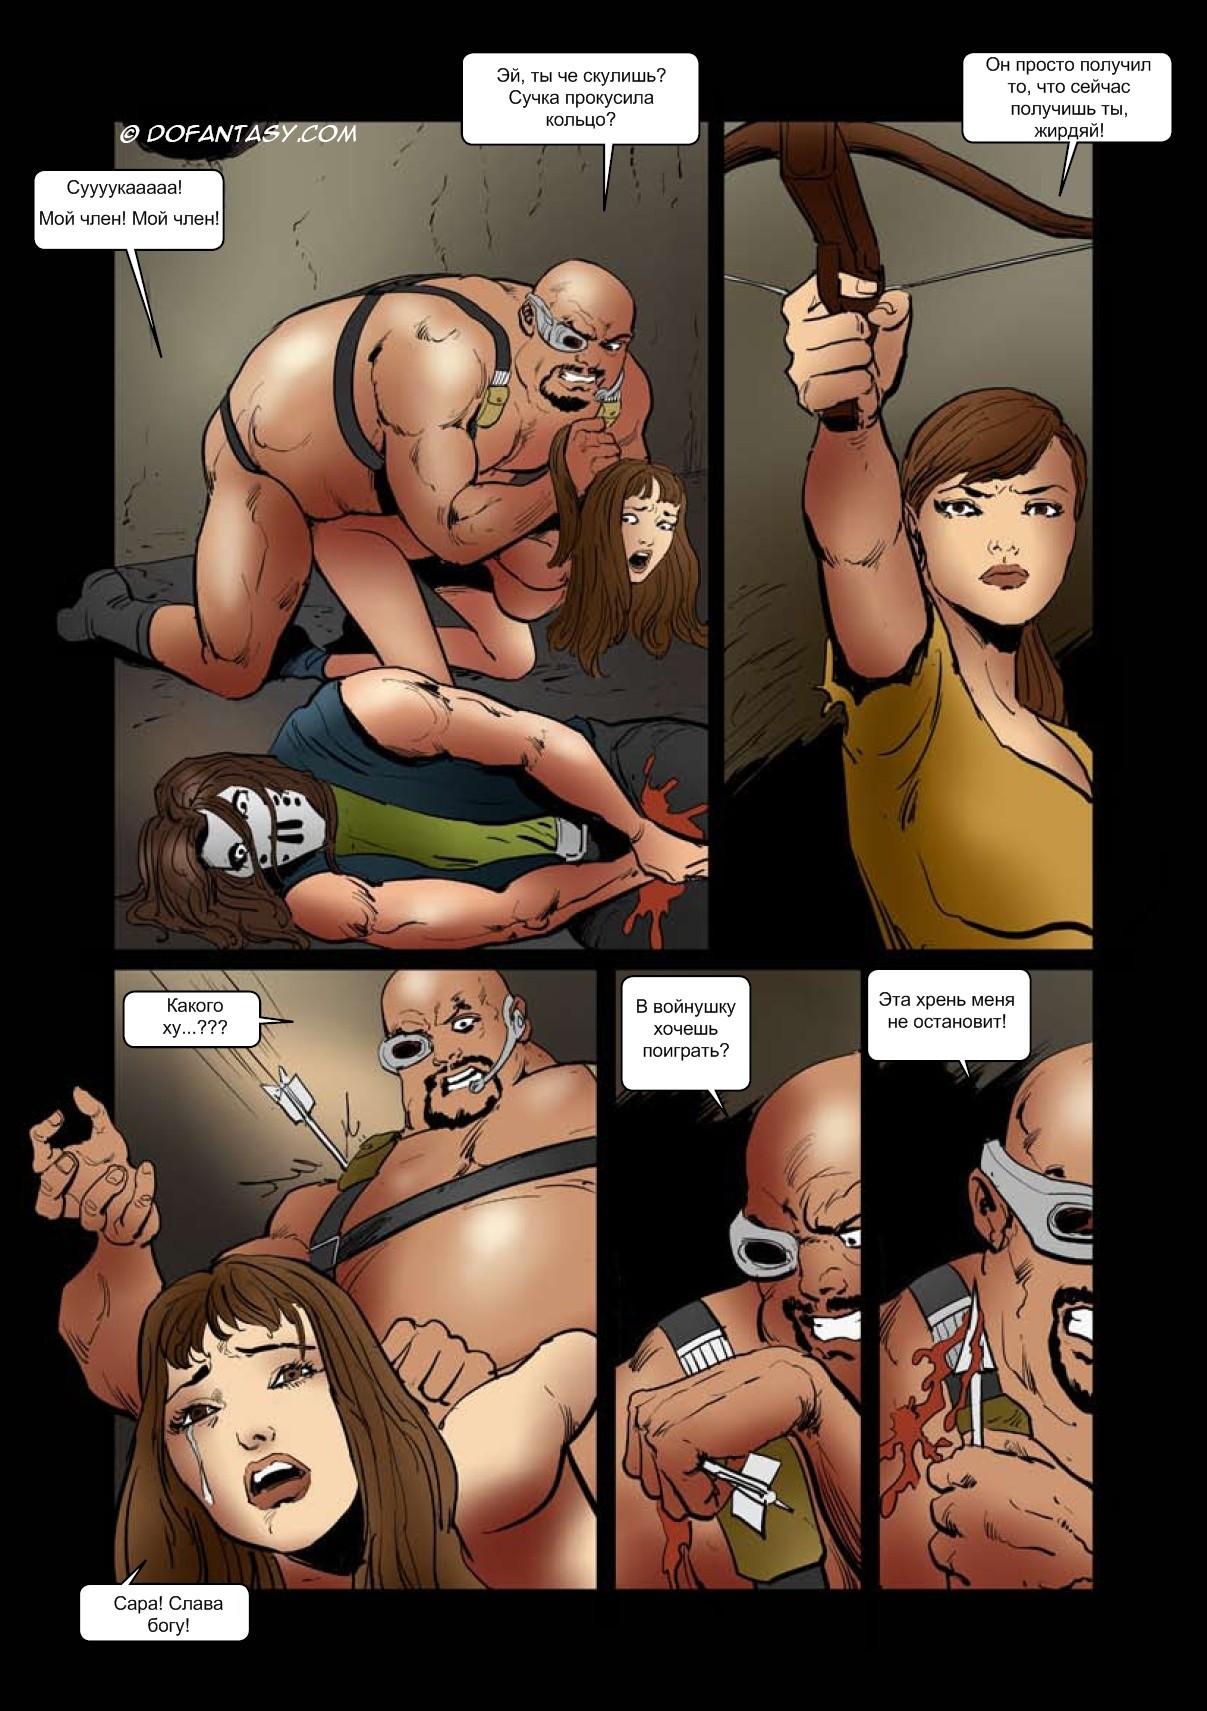 velikiy-seks